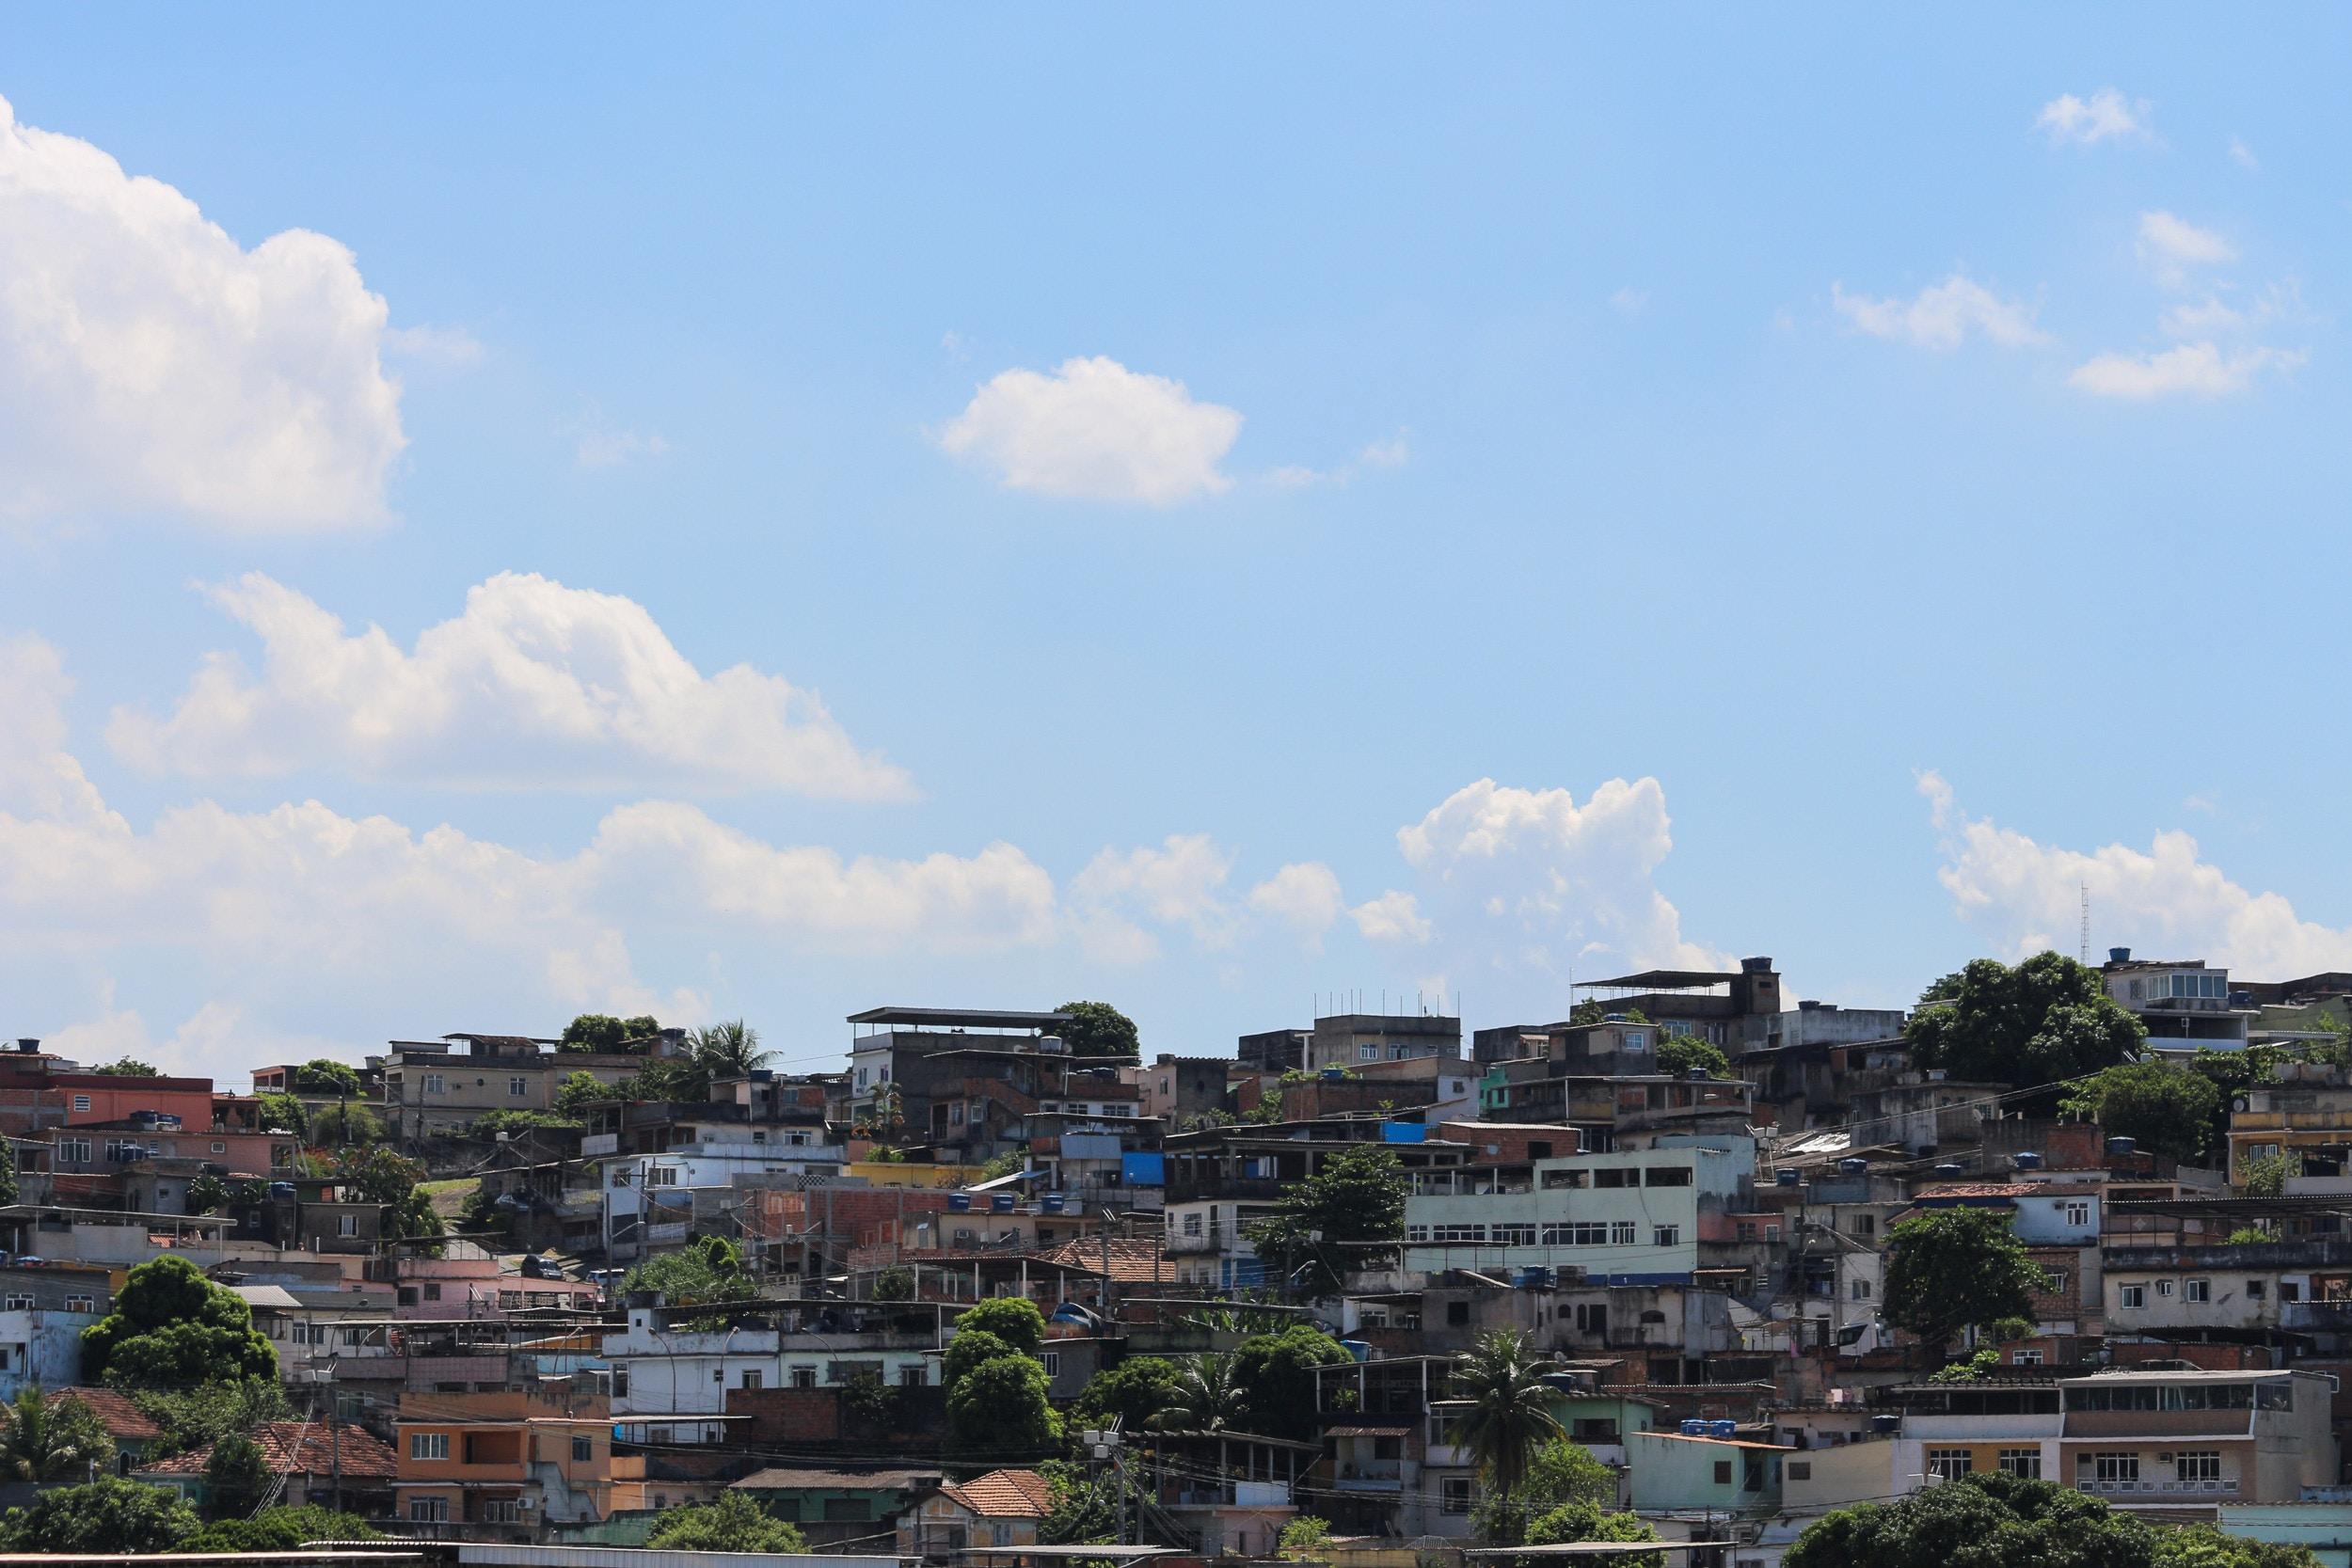 ataque de virus hoje no brasil